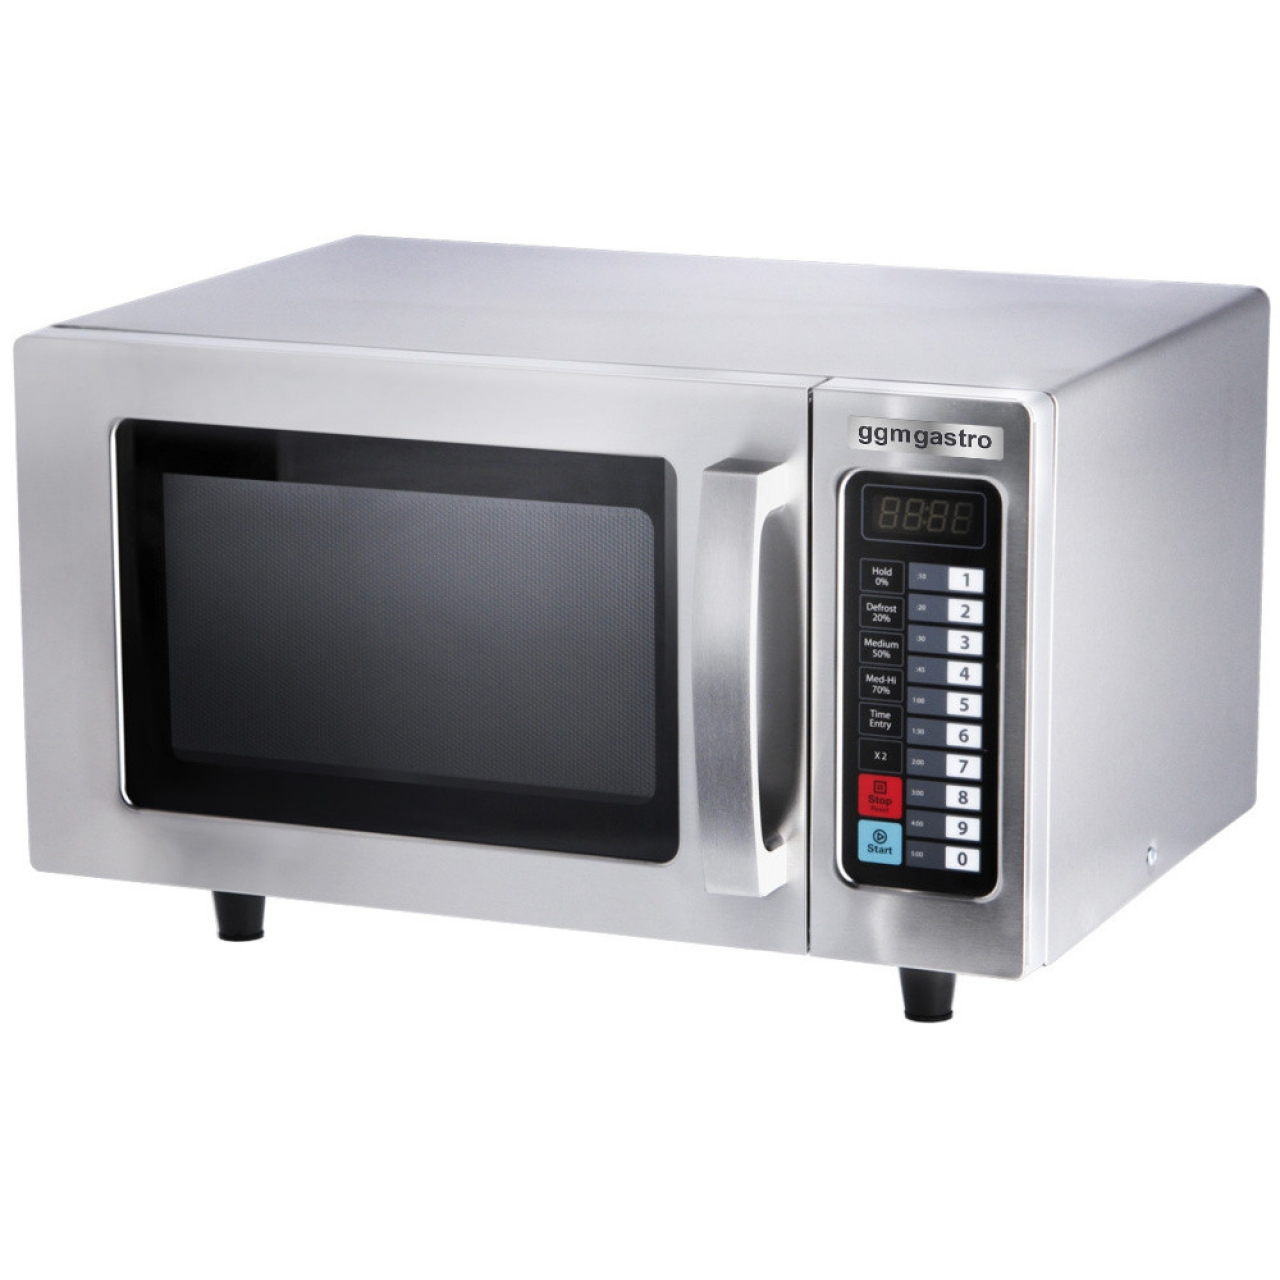 Microwave 25L digital